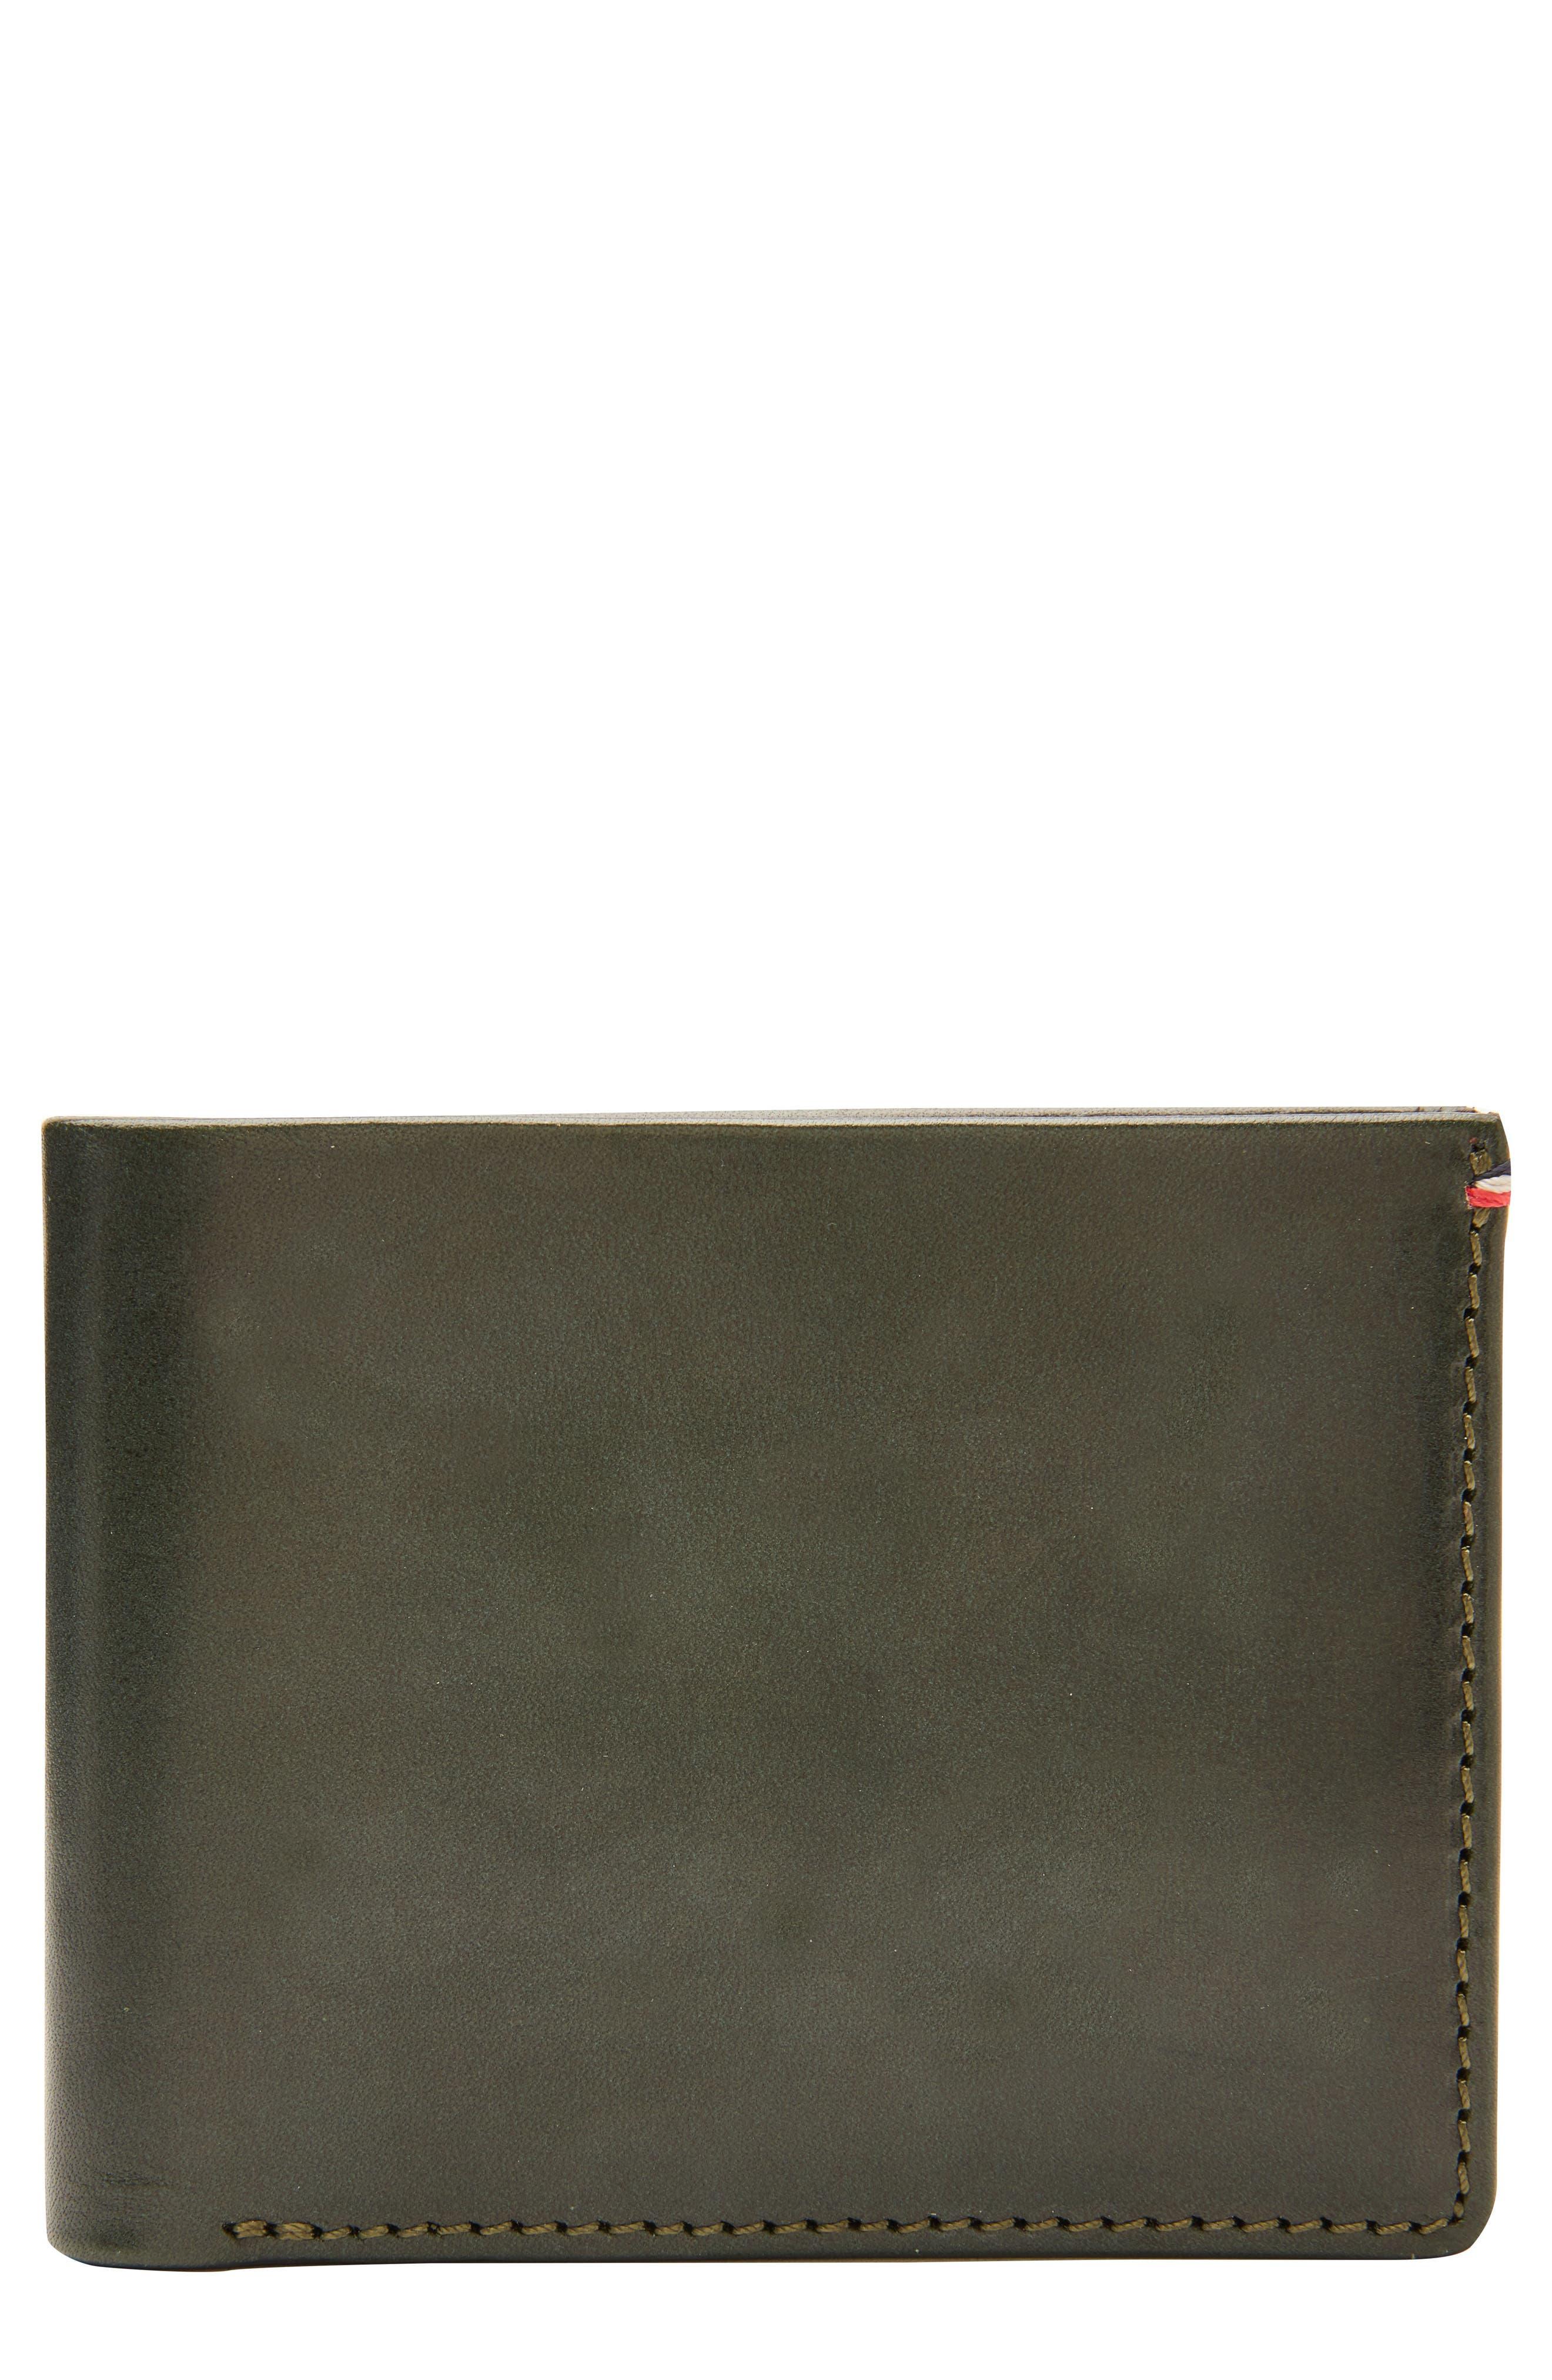 Core Leather Wallet,                         Main,                         color,